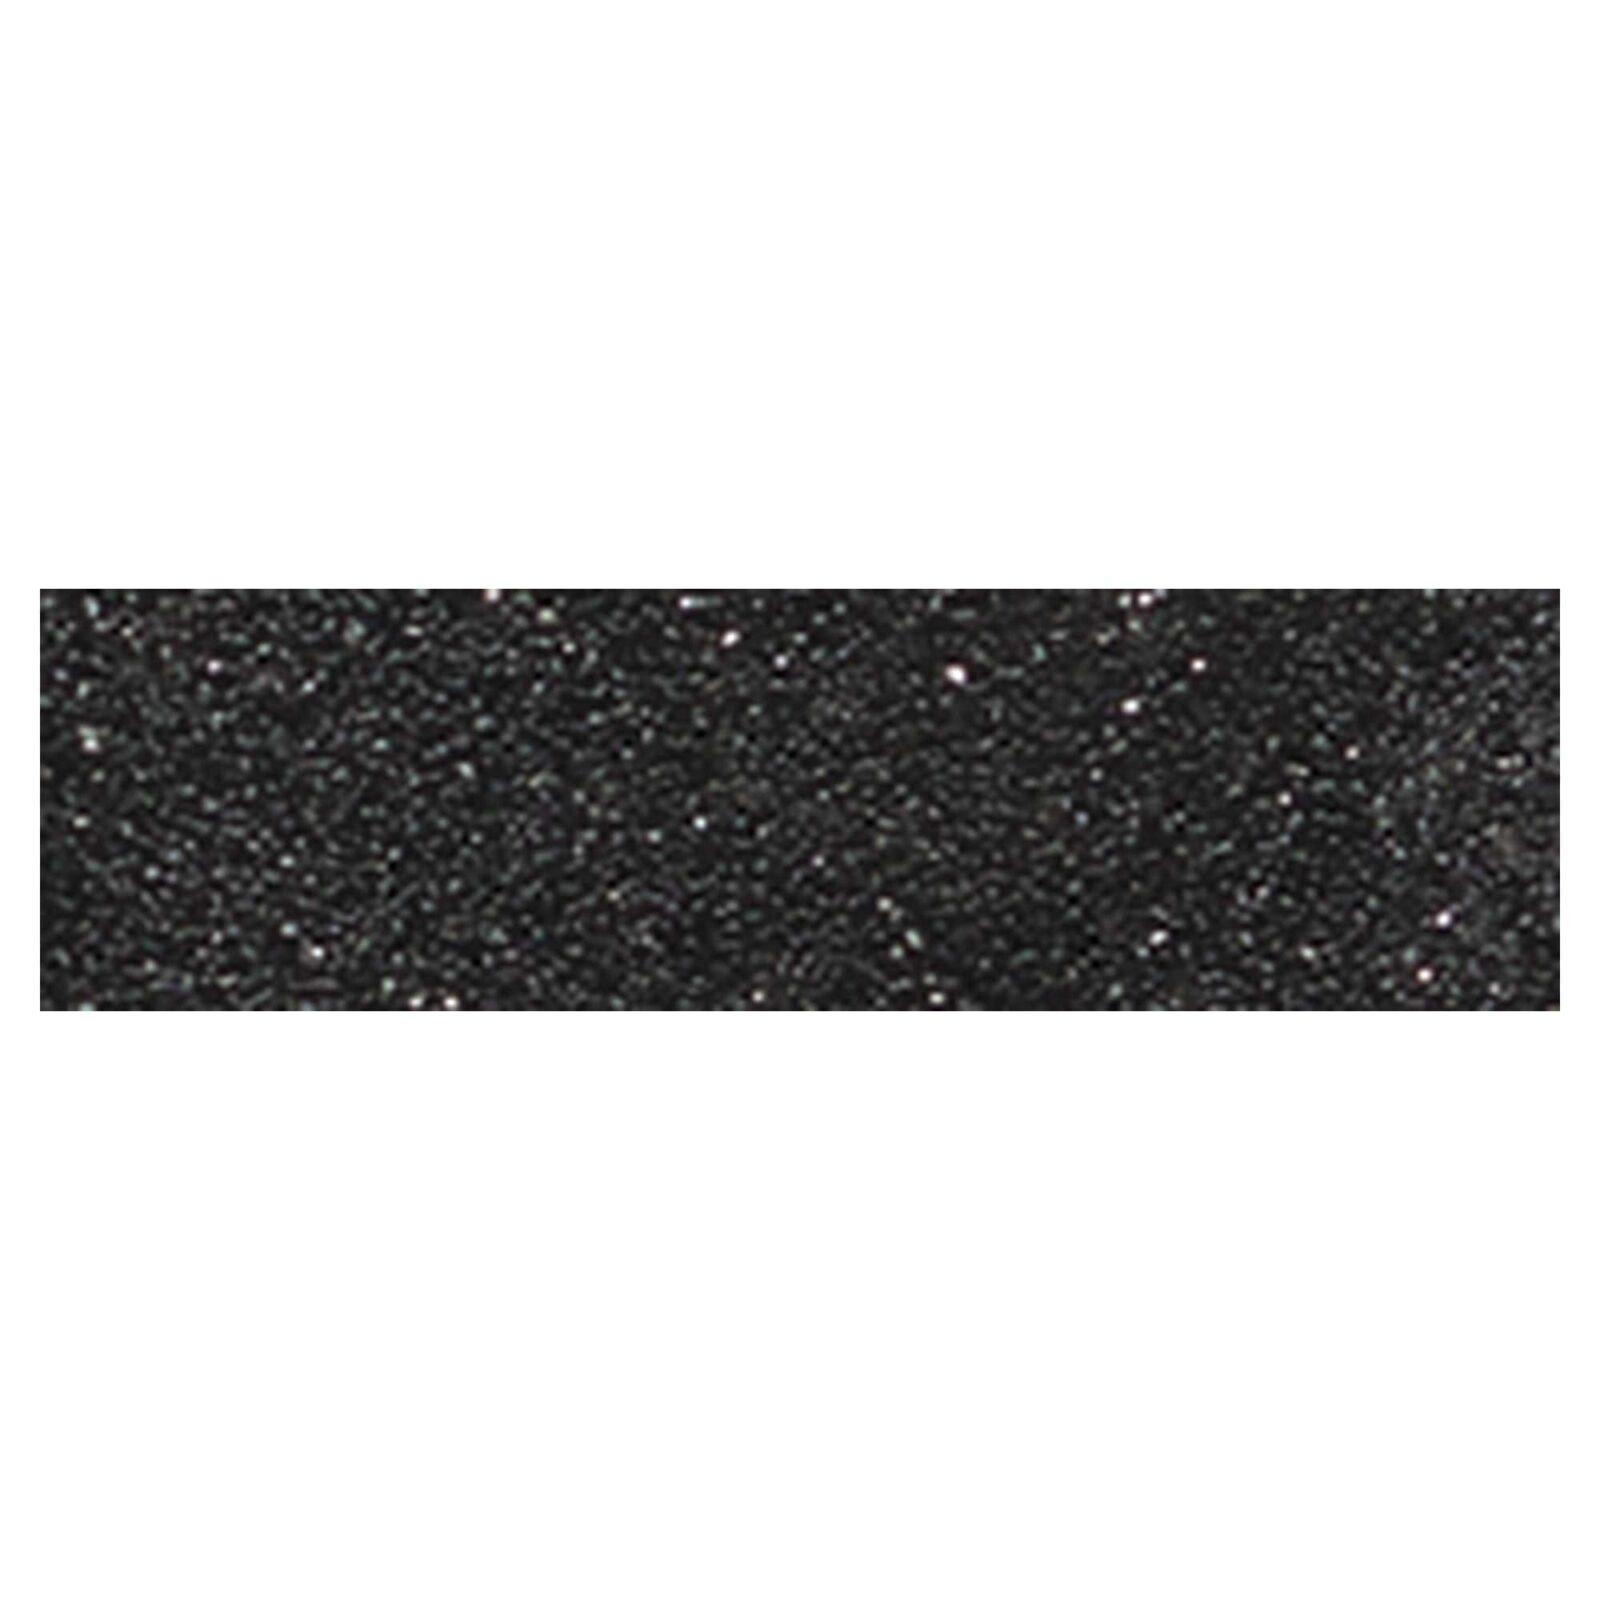 Мойка G-12(грей) (770х495х190) из гранитной крошки+сифон